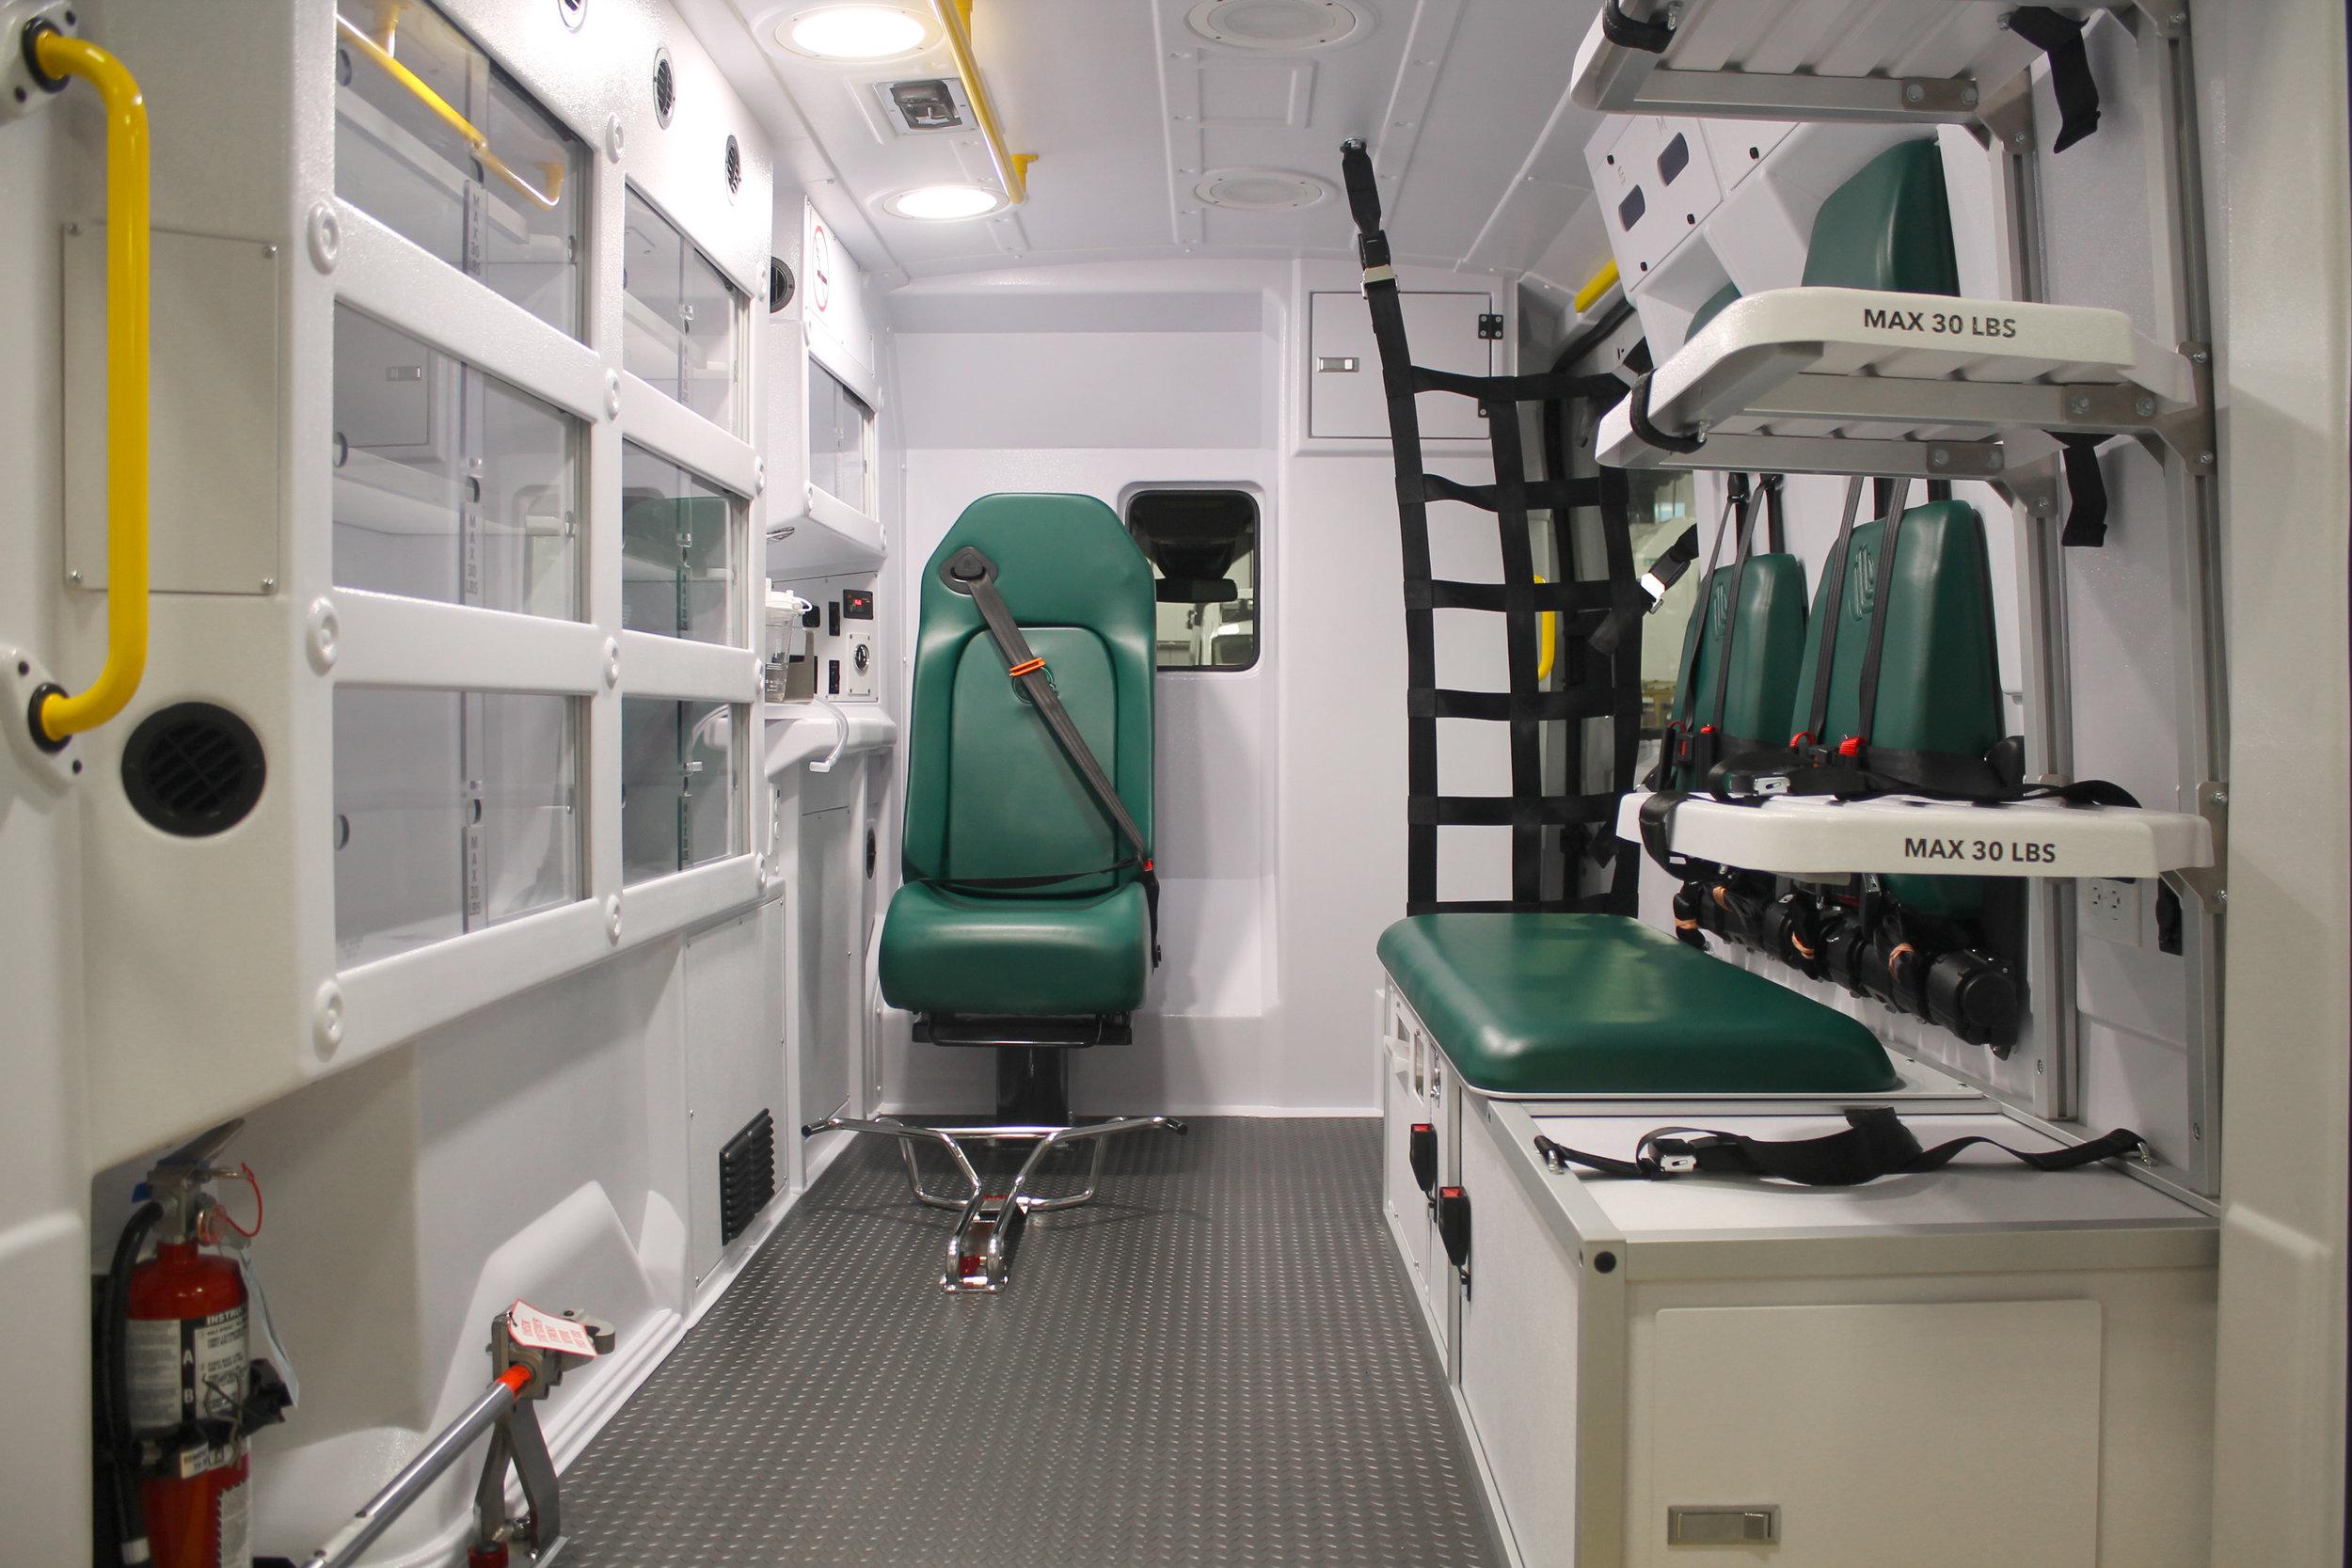 a1021-senior-care-transit-hendrickson_001.JPG